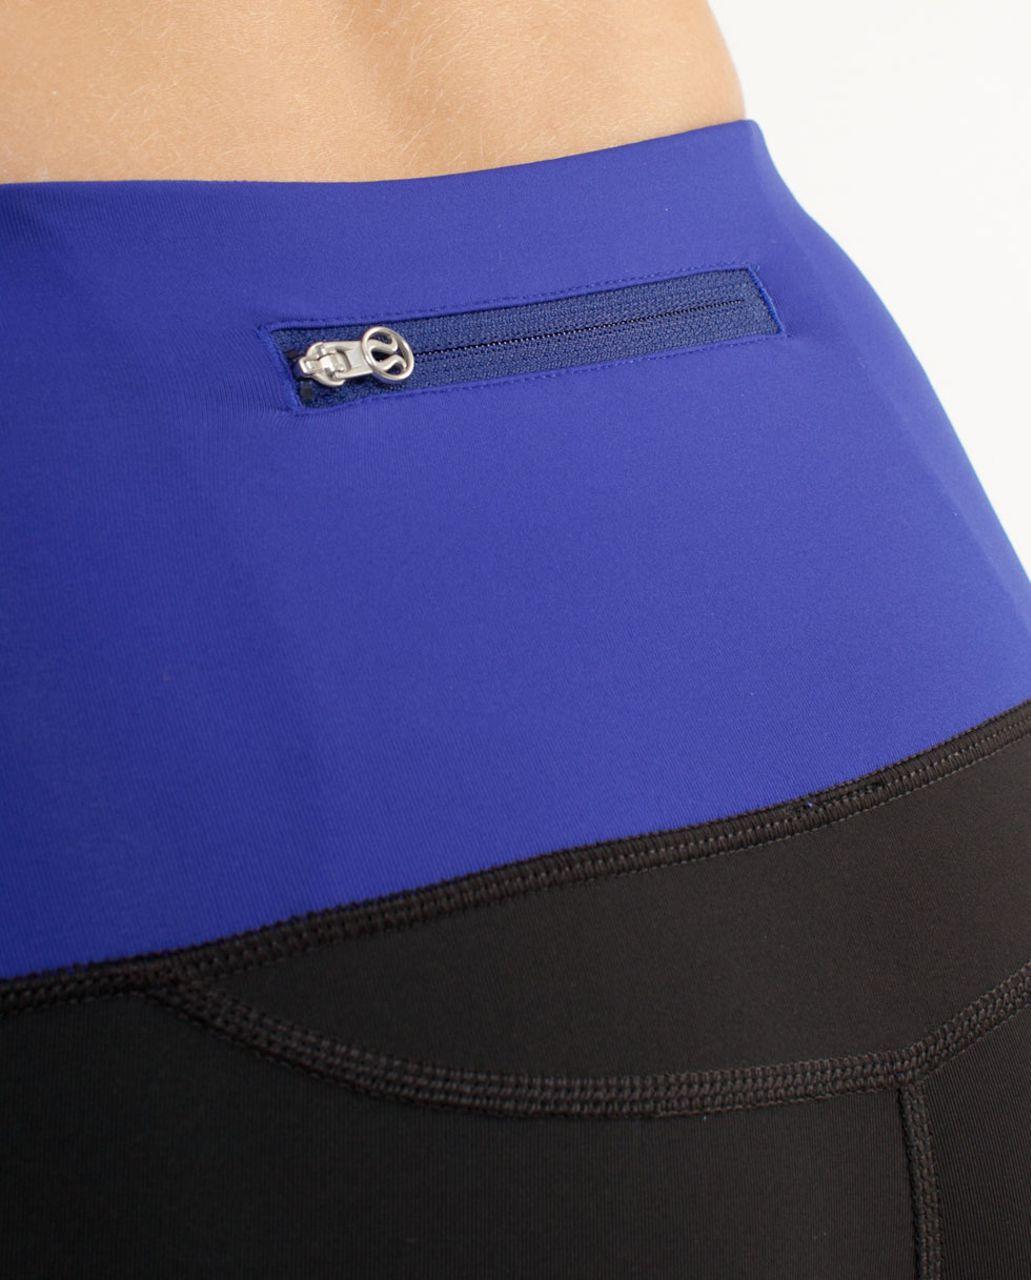 Lululemon Run:  Back on Track Tight - Black /  Pigment Blue /  Pigment Blue White Microstripe